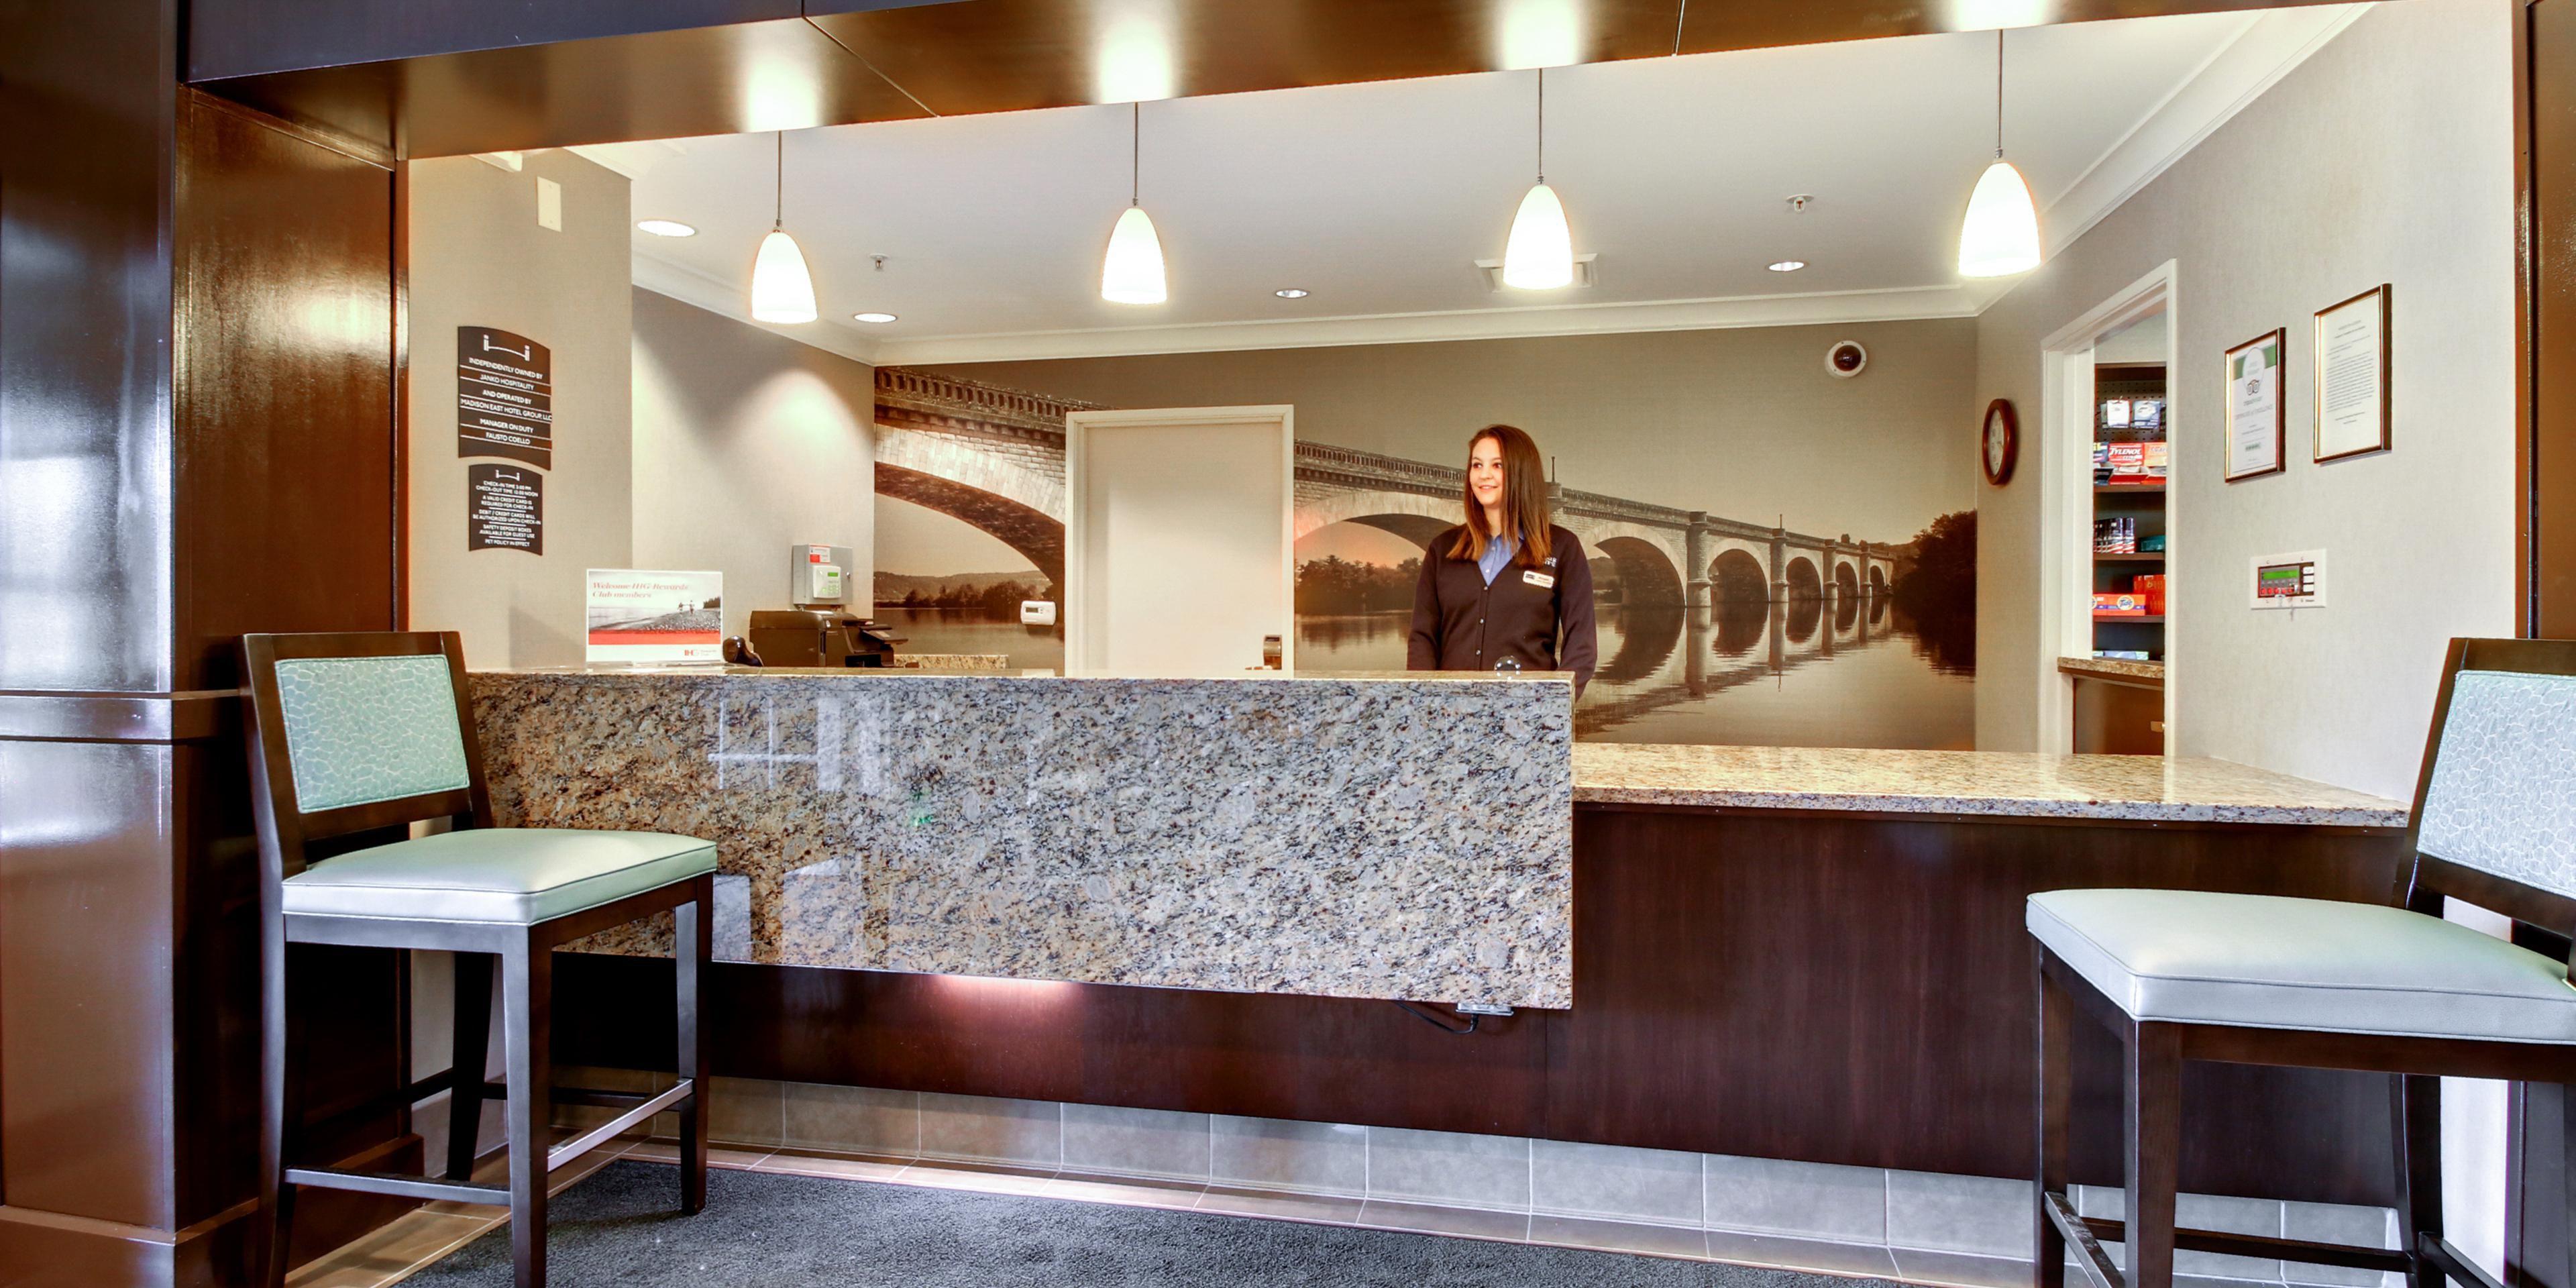 Madison Hotels Staybridge Suites Madison-East - Extended Stay Hotel in Madison Wisconsin & Madison Hotels: Staybridge Suites Madison-East - Extended Stay Hotel ...